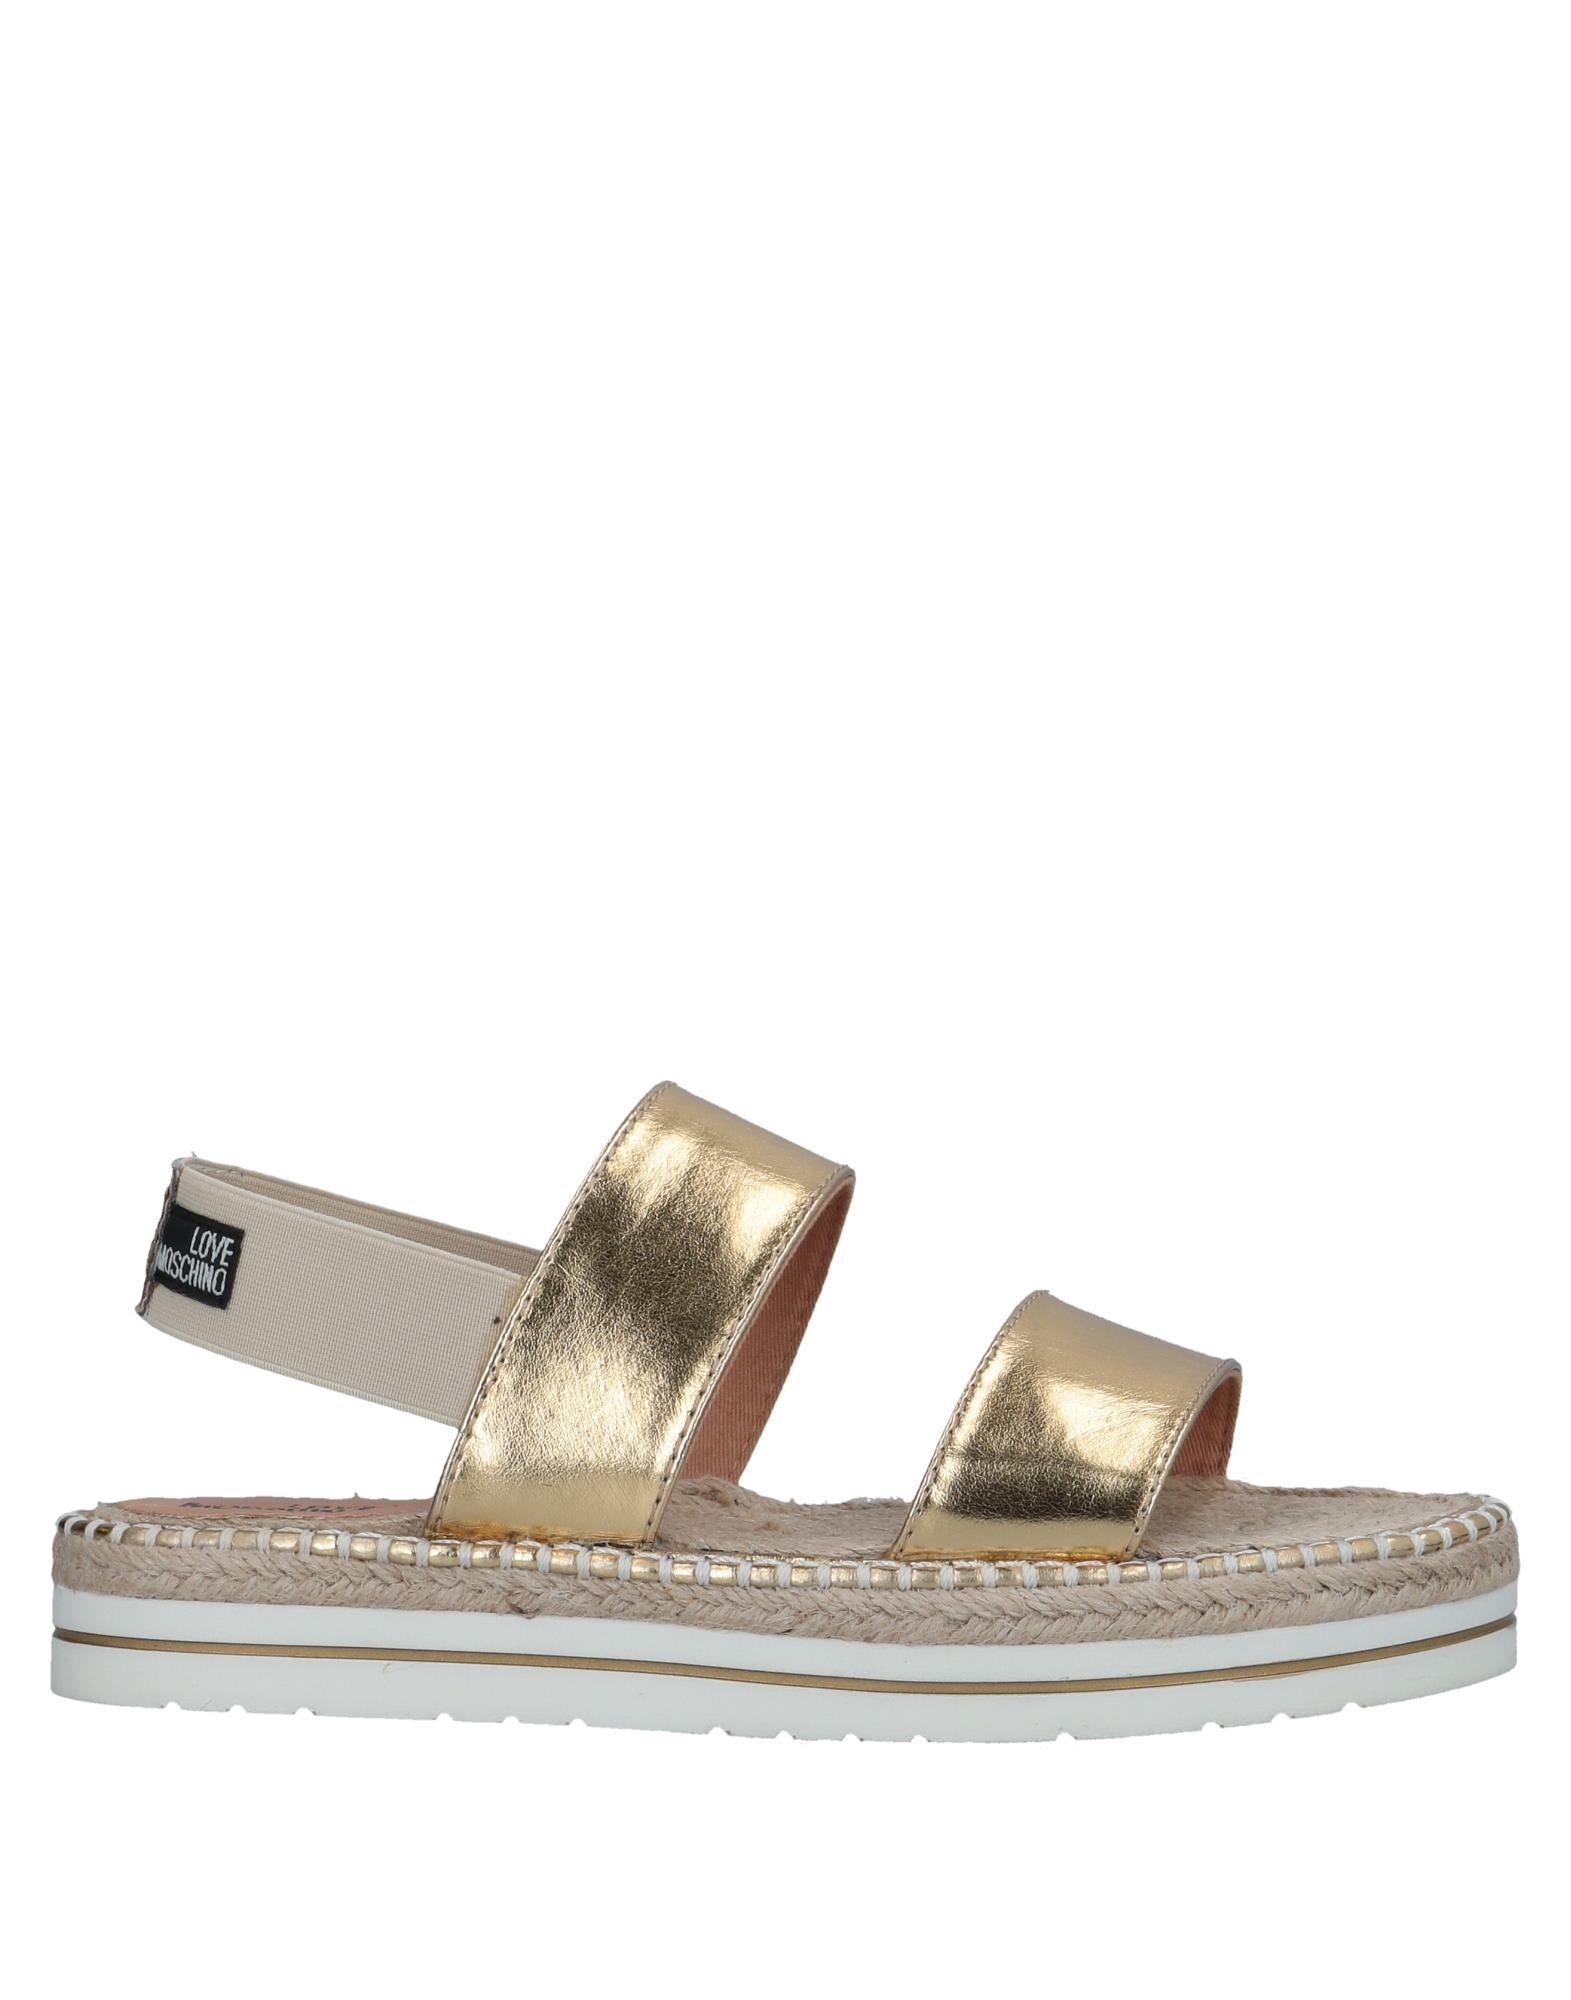 Love Moschino Sandalen Damen  11525808SM Gute Qualität beliebte Schuhe